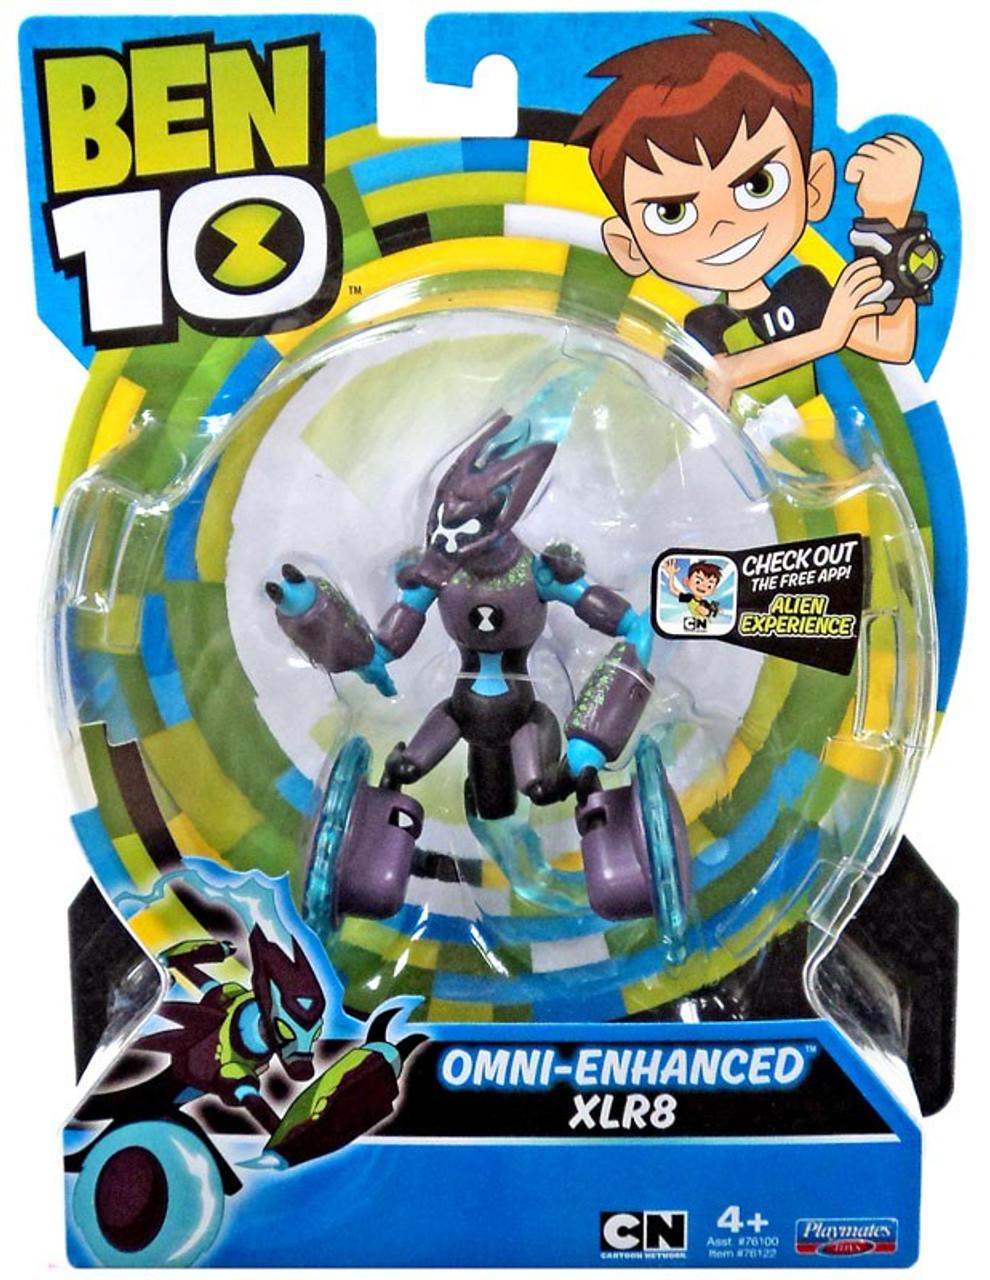 Ben 10 Basic Omni Enhanced XLR8 5 Action Figure Playmates